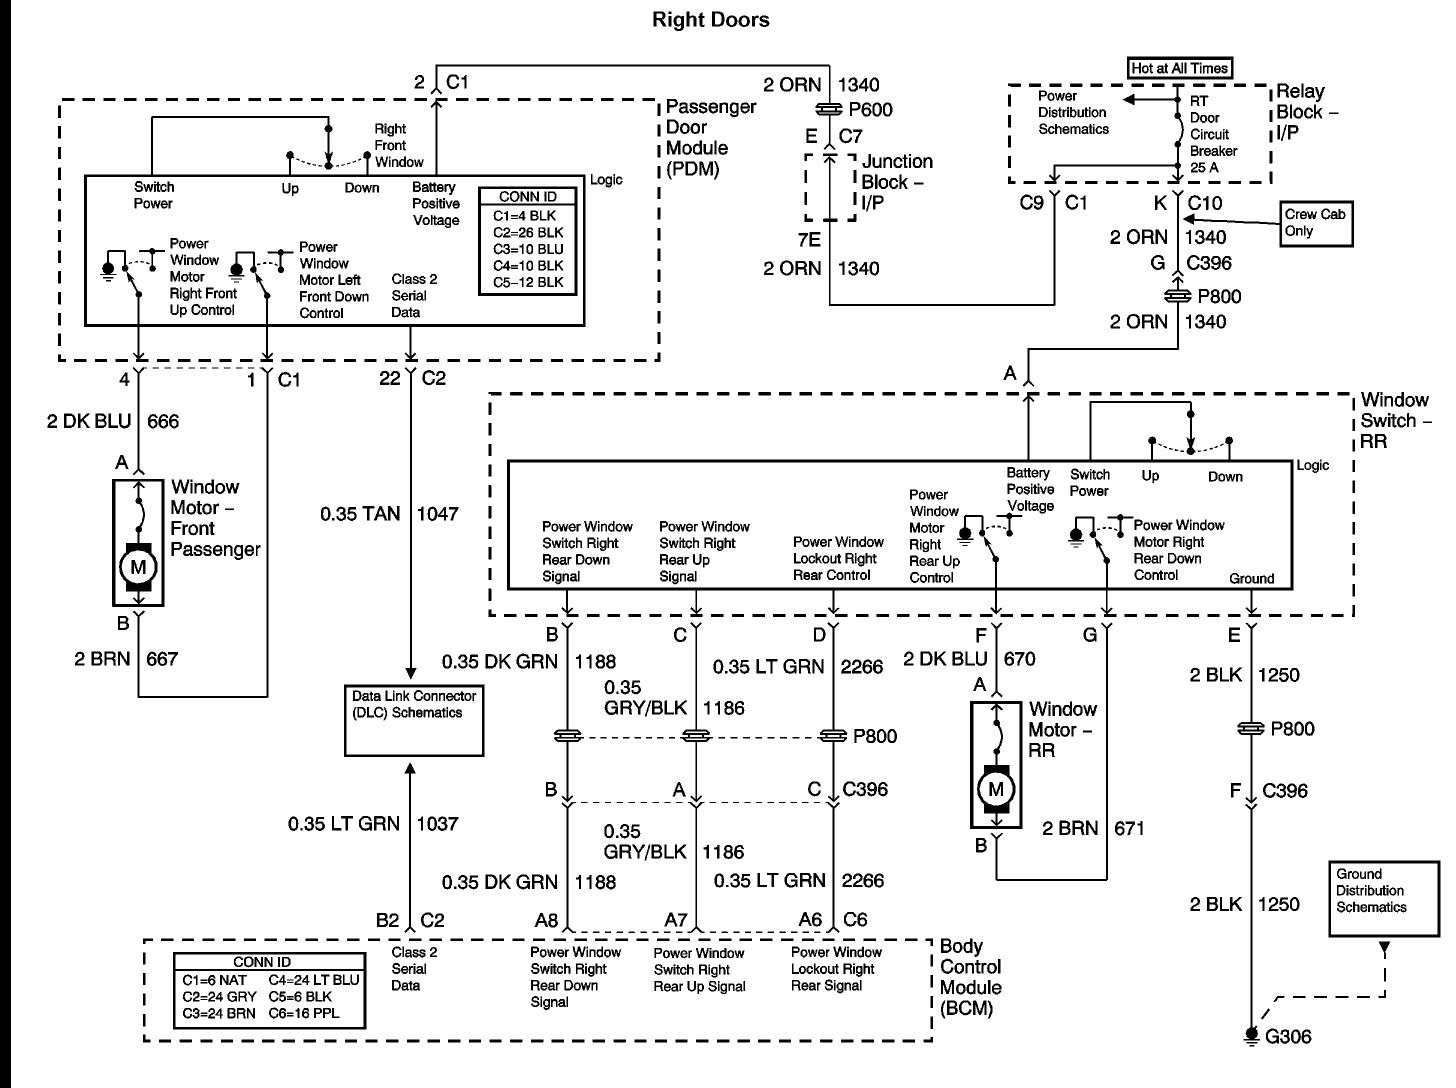 2004 Chevy Silverado Passenger Power Windows  I Have A